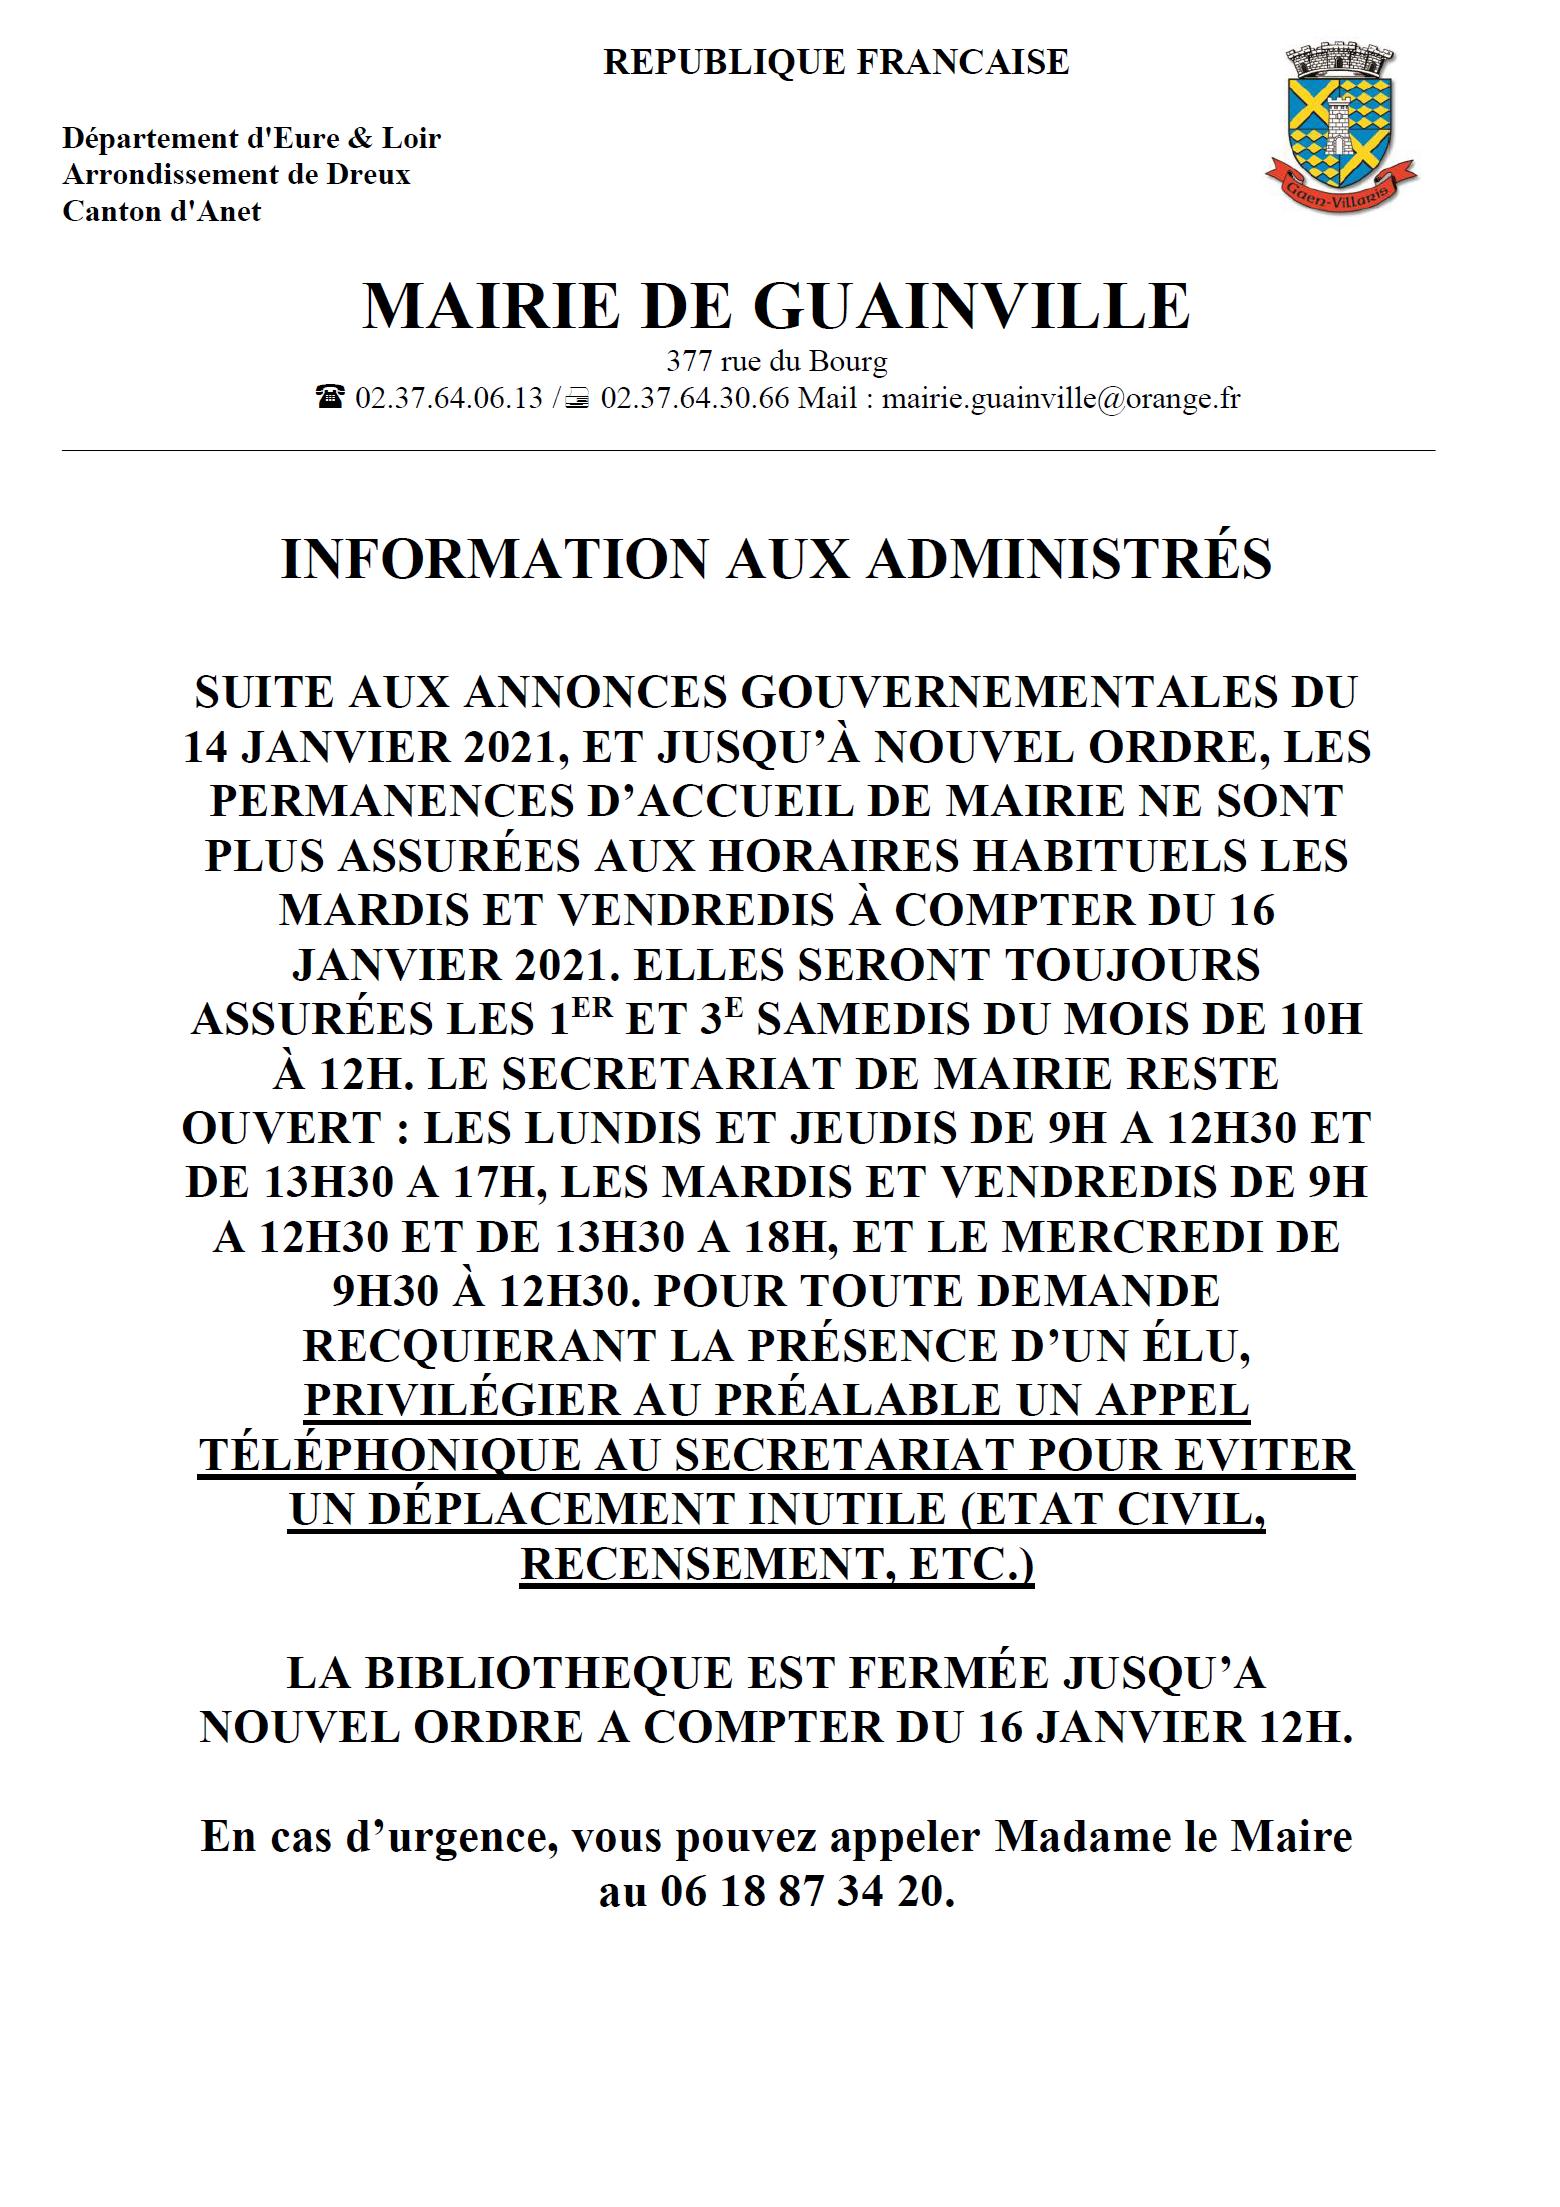 Information modifs accueil mairie